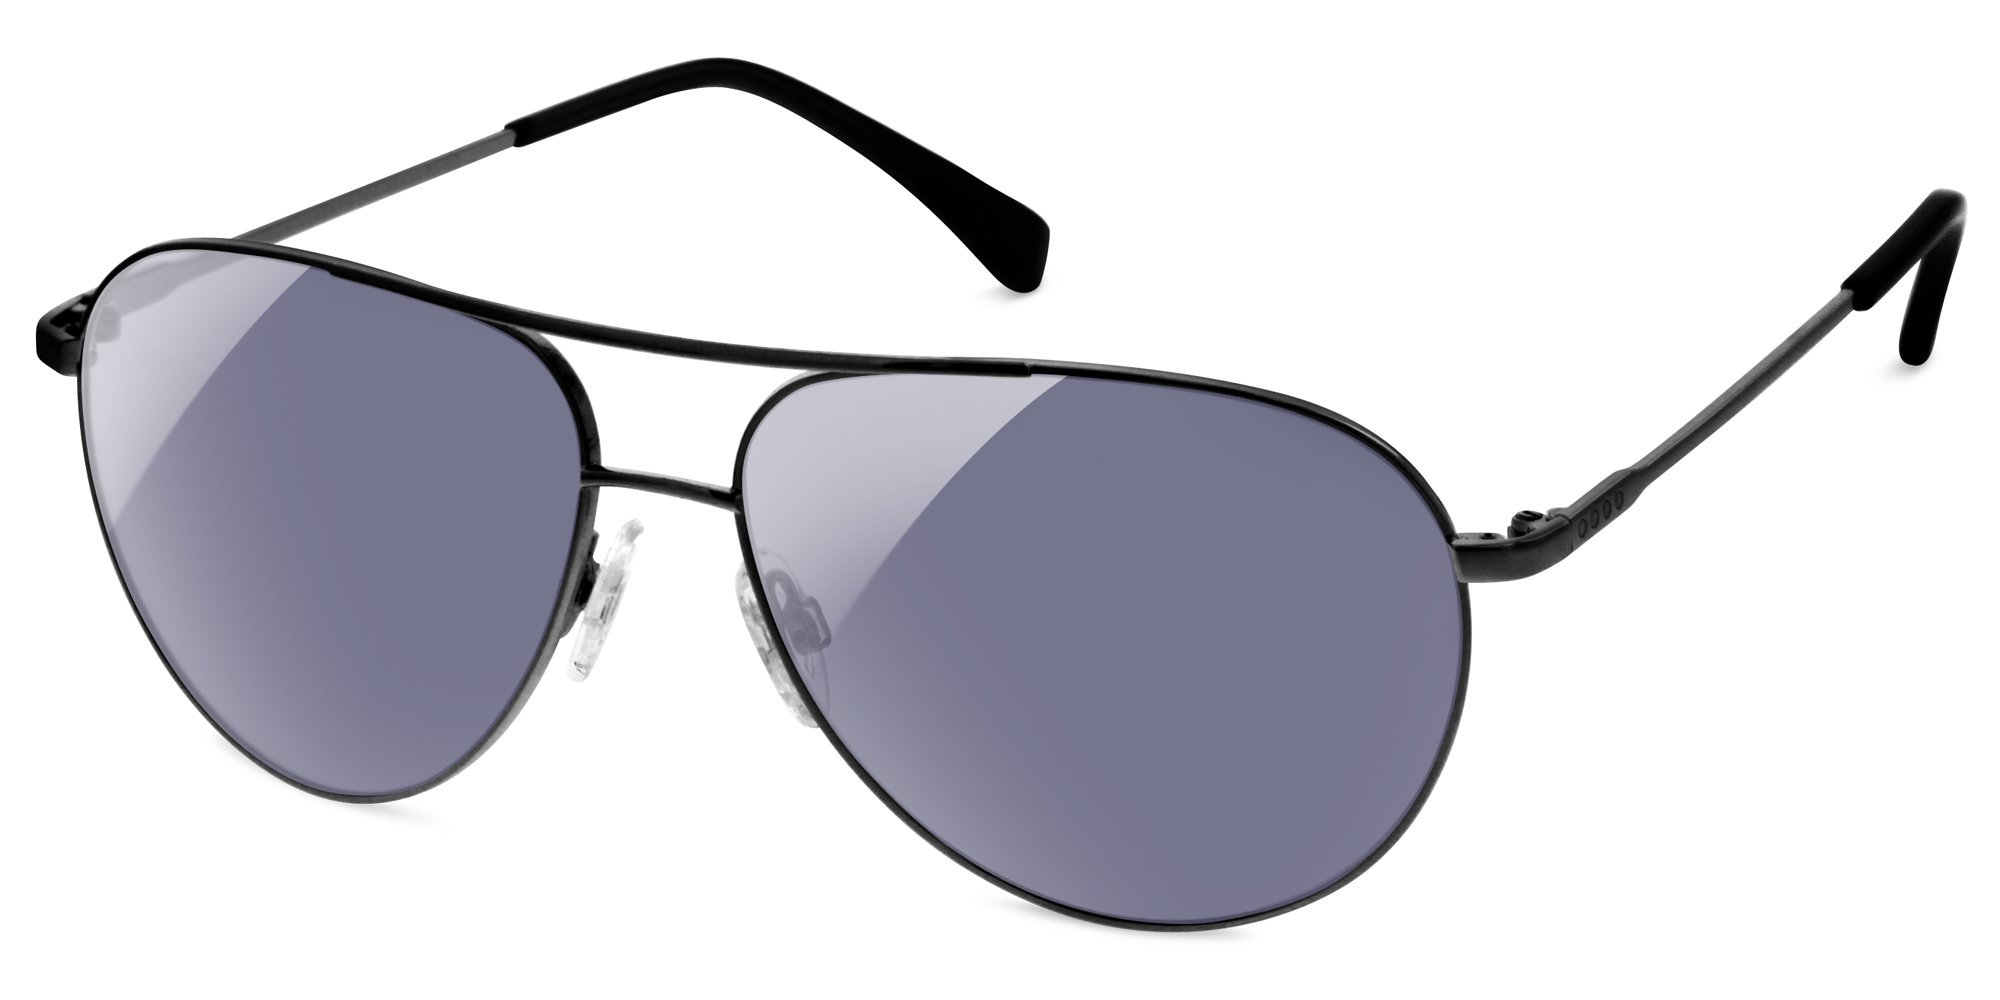 04eb4d1687 EnChroma Color Blind Glasses - Atlas Gunmetal Aviator- Cx3 Sun For Deutan  and Protan Color Blindness